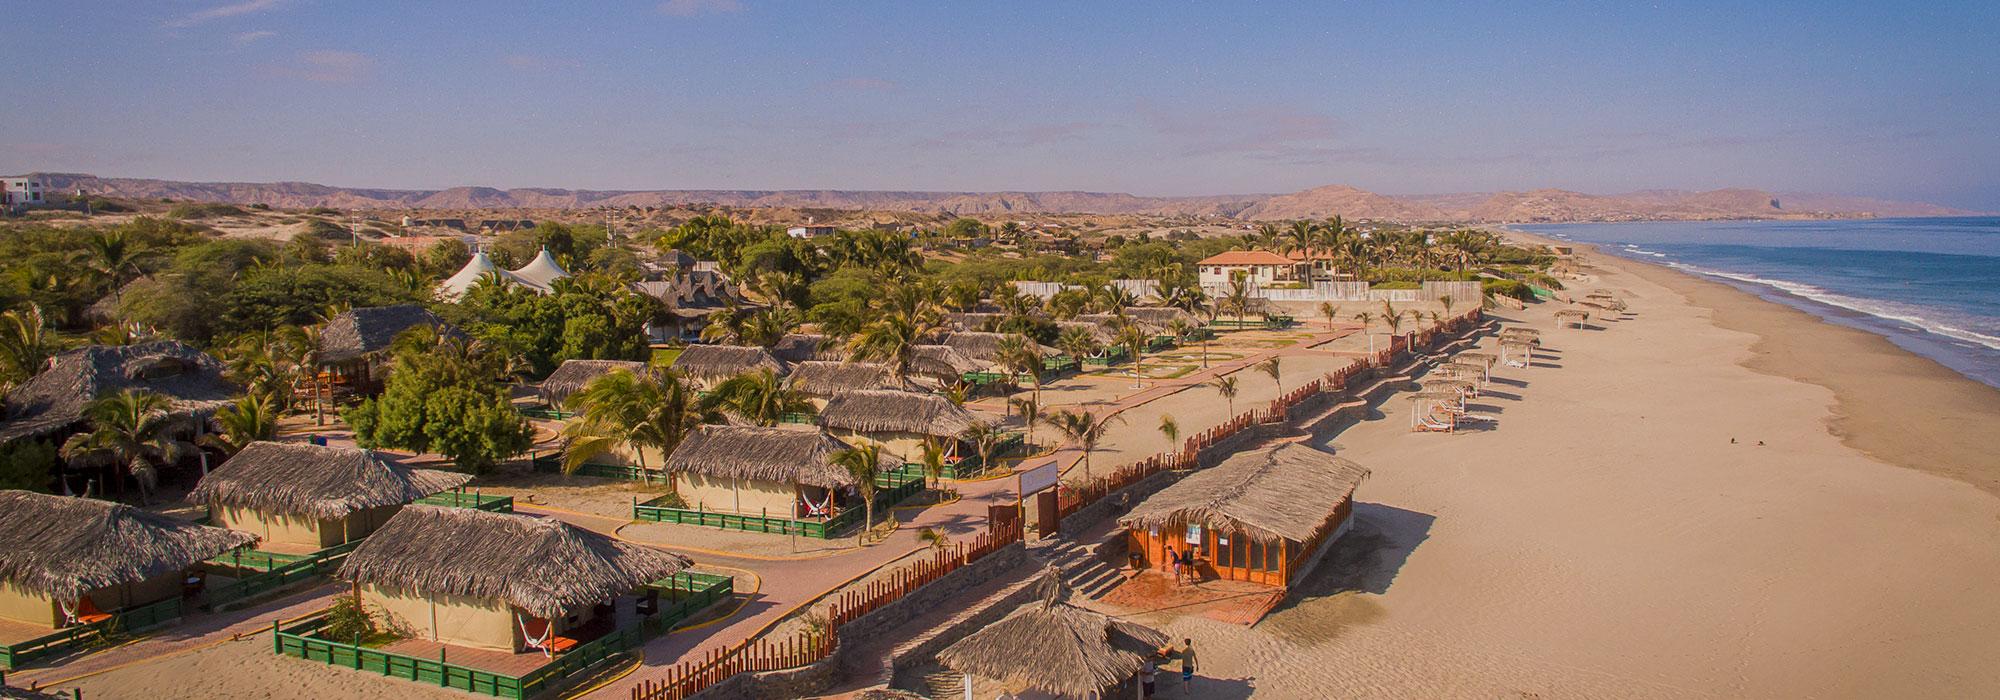 aranwa-hoteles-piura-Vichayito-Bungalows-Carpas-by-Aranwa-banner-3